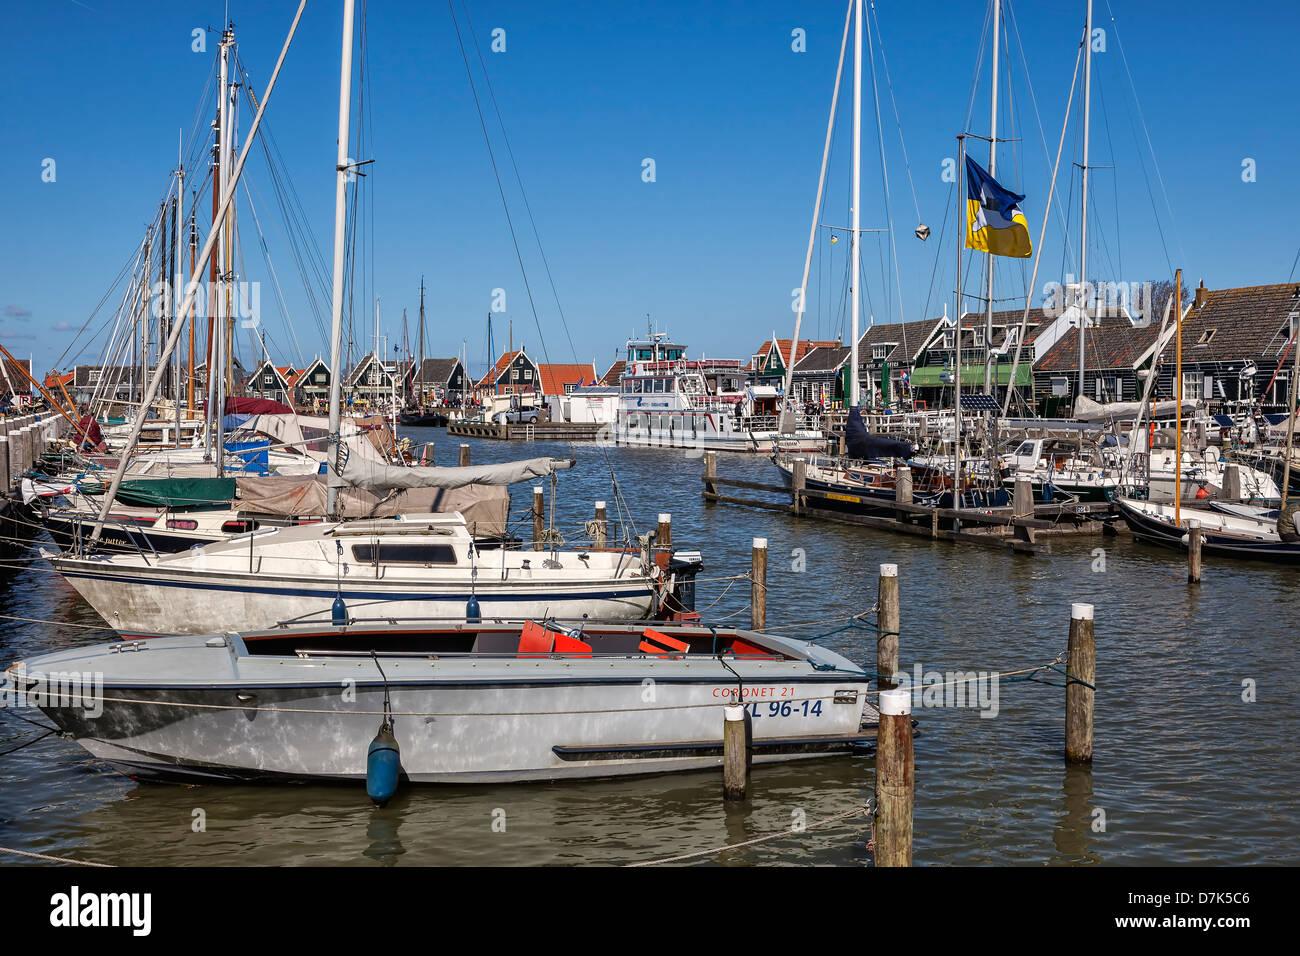 Marken, Waterland, North Holland, Netherlands - Stock Image